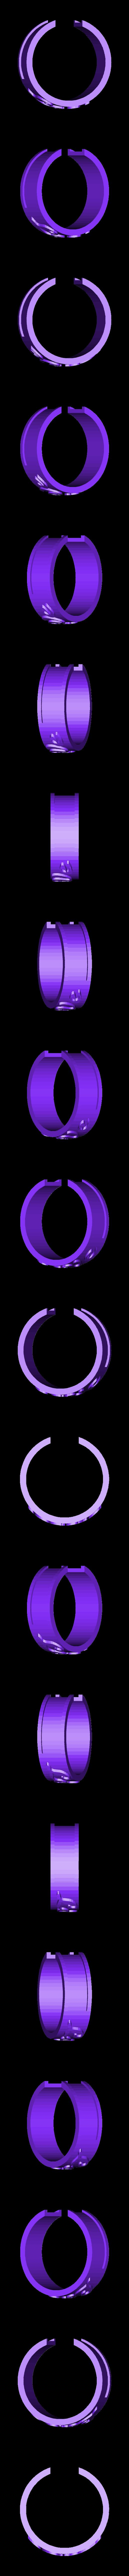 anillo love 19 abierto hendidura 2 (1).stl Télécharger fichier STL gratuit Anillo / Ring Love • Design pour impression 3D, amg3D